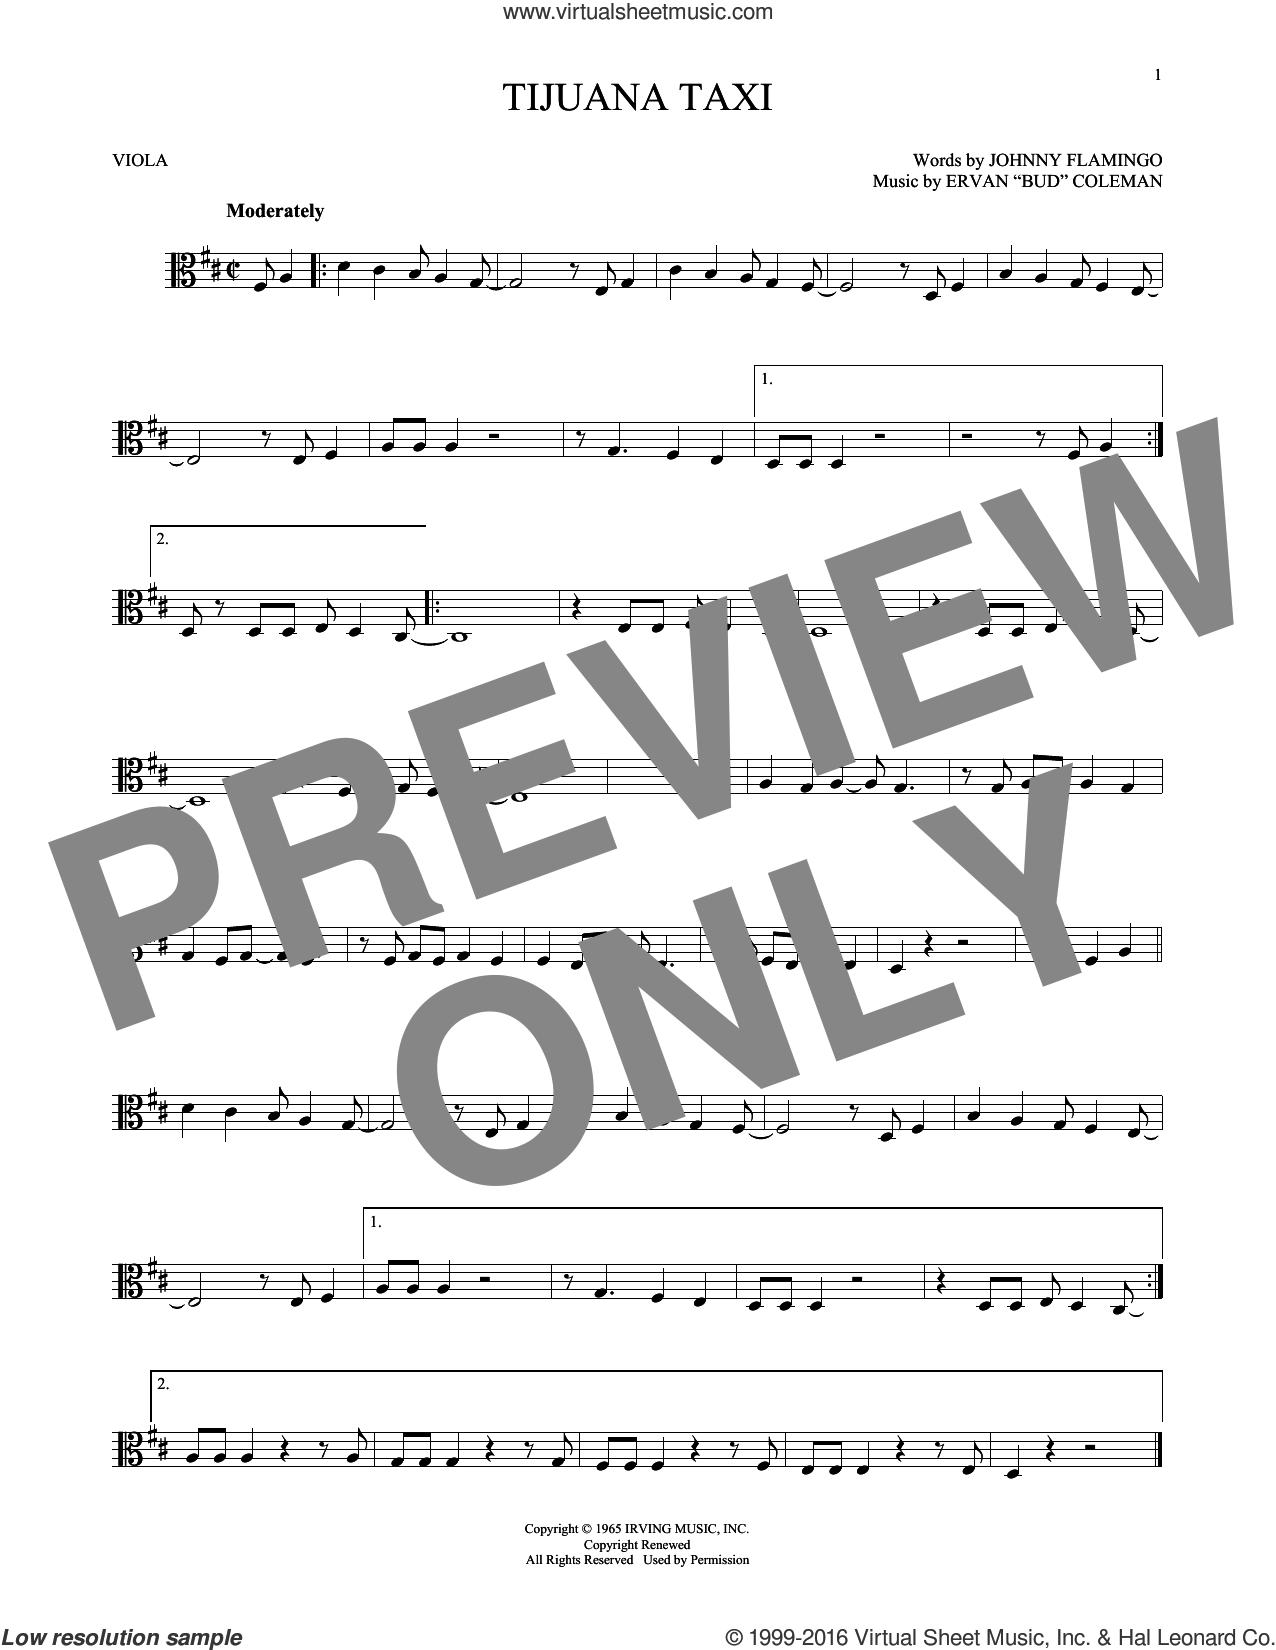 Tijuana Taxi sheet music for viola solo by Herb Alpert & The Tijuana Brass, Ervan 'Bud' Coleman and Johnny Flamingo, intermediate skill level